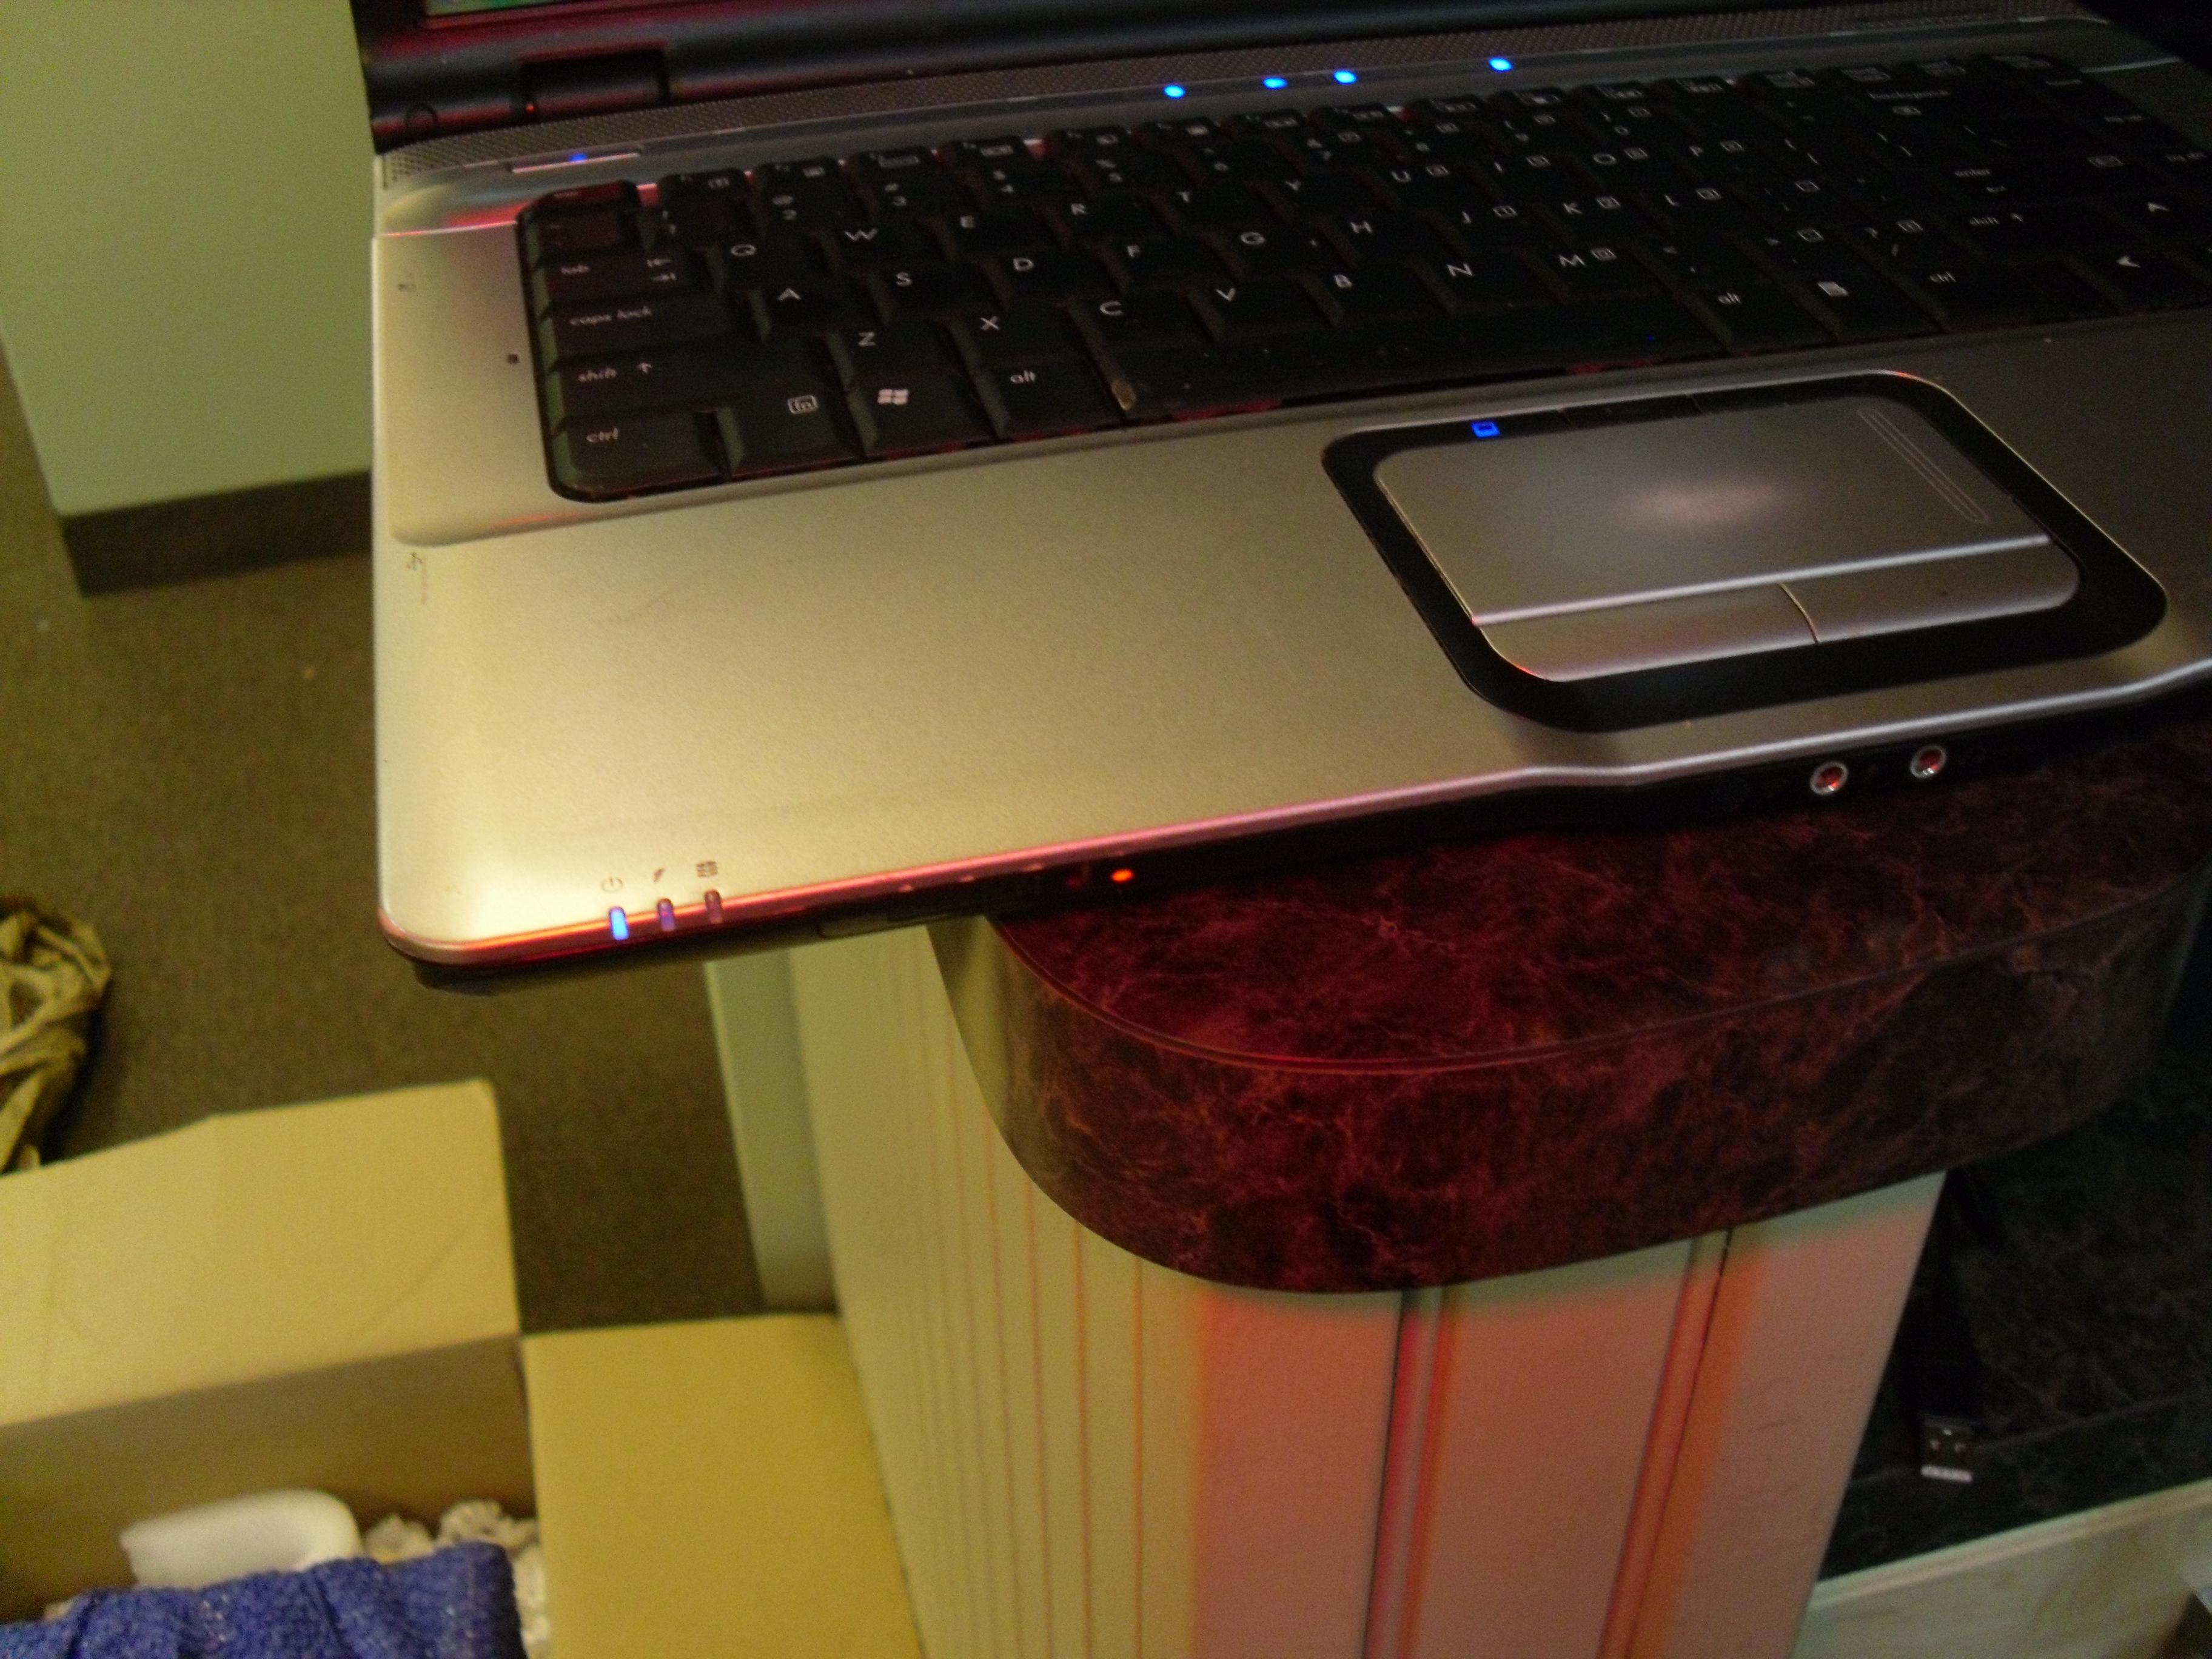 The notorious HP/Compaq Wireless Orange Light of Doom